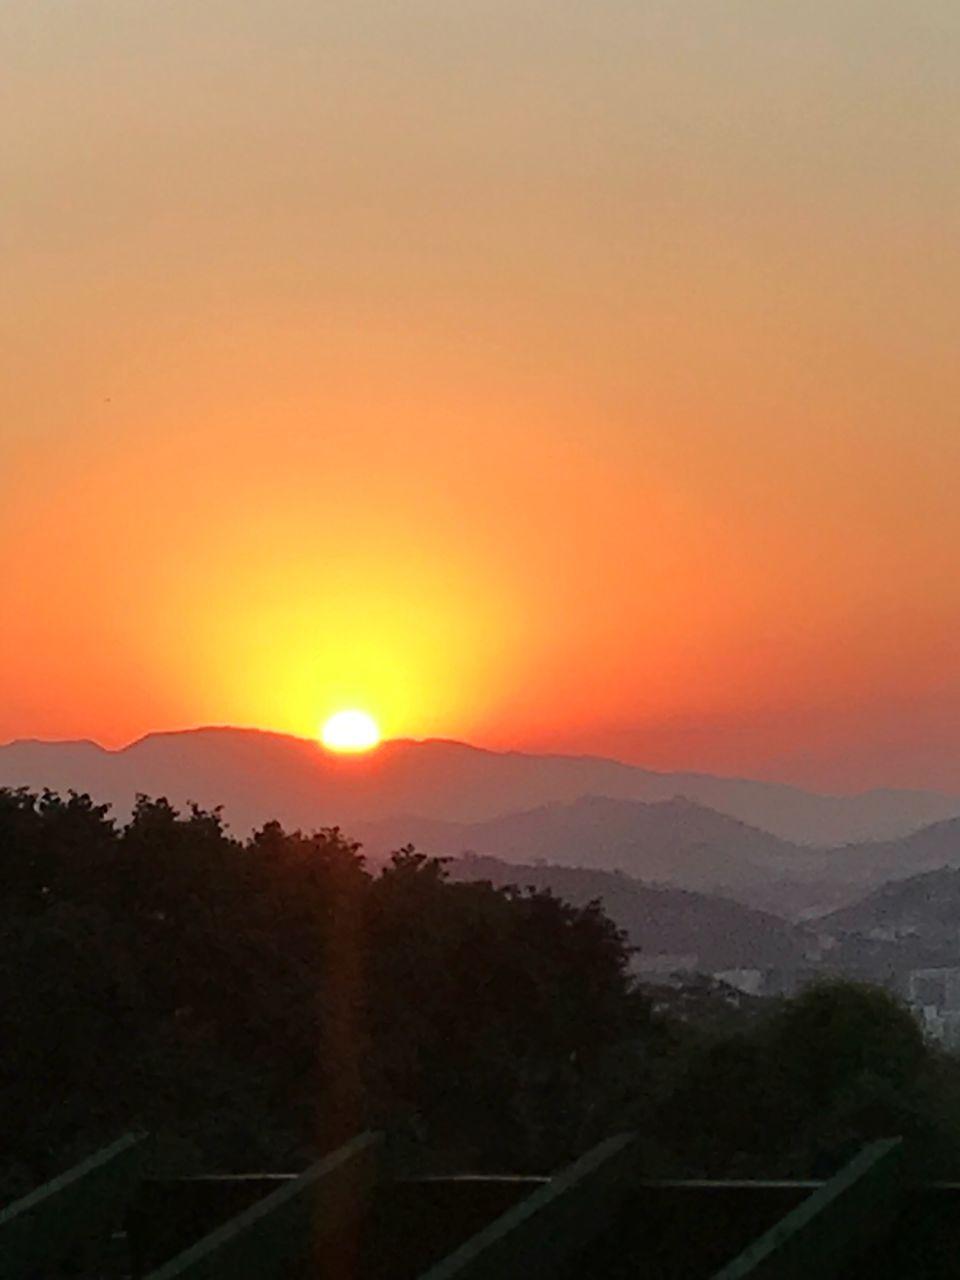 sunset, sky, beauty in nature, scenics - nature, orange color, sun, mountain, plant, landscape, tree, tranquil scene, environment, tranquility, no people, nature, mountain range, idyllic, non-urban scene, copy space, sunlight, outdoors, romantic sky